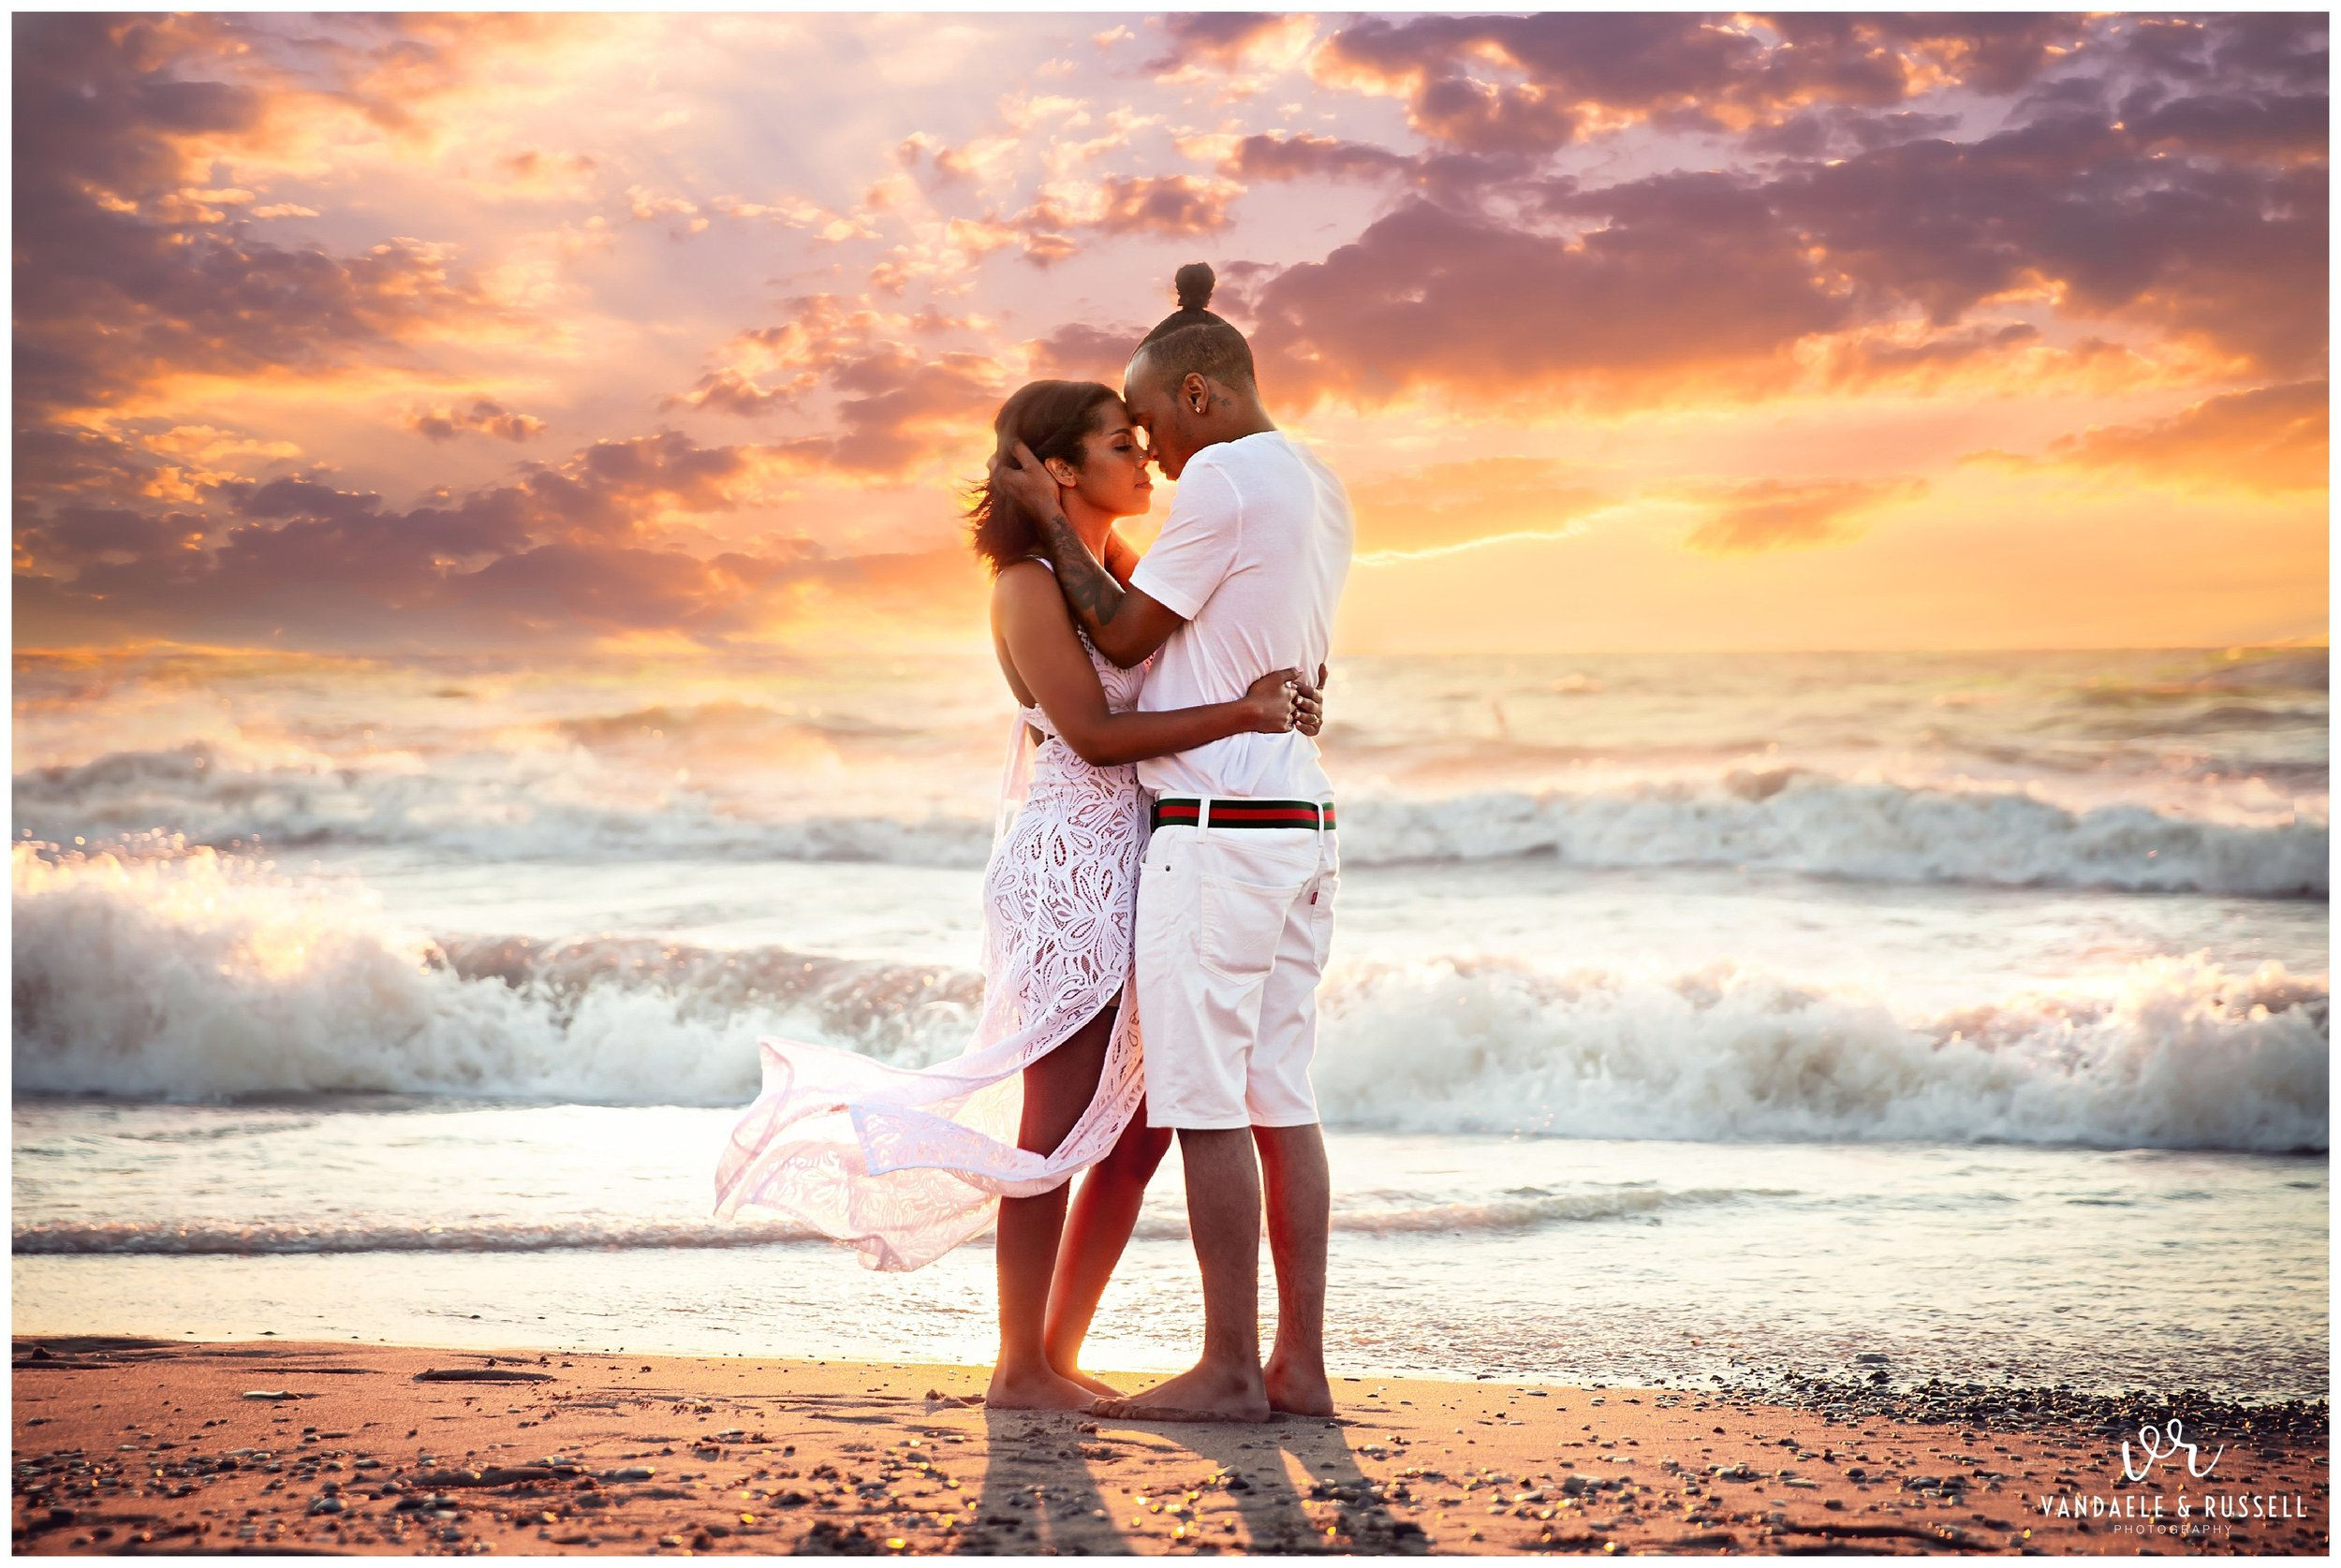 VanDaele-Russell-Wedding-Photography-London-Toronto-Ontario_0138.jpg